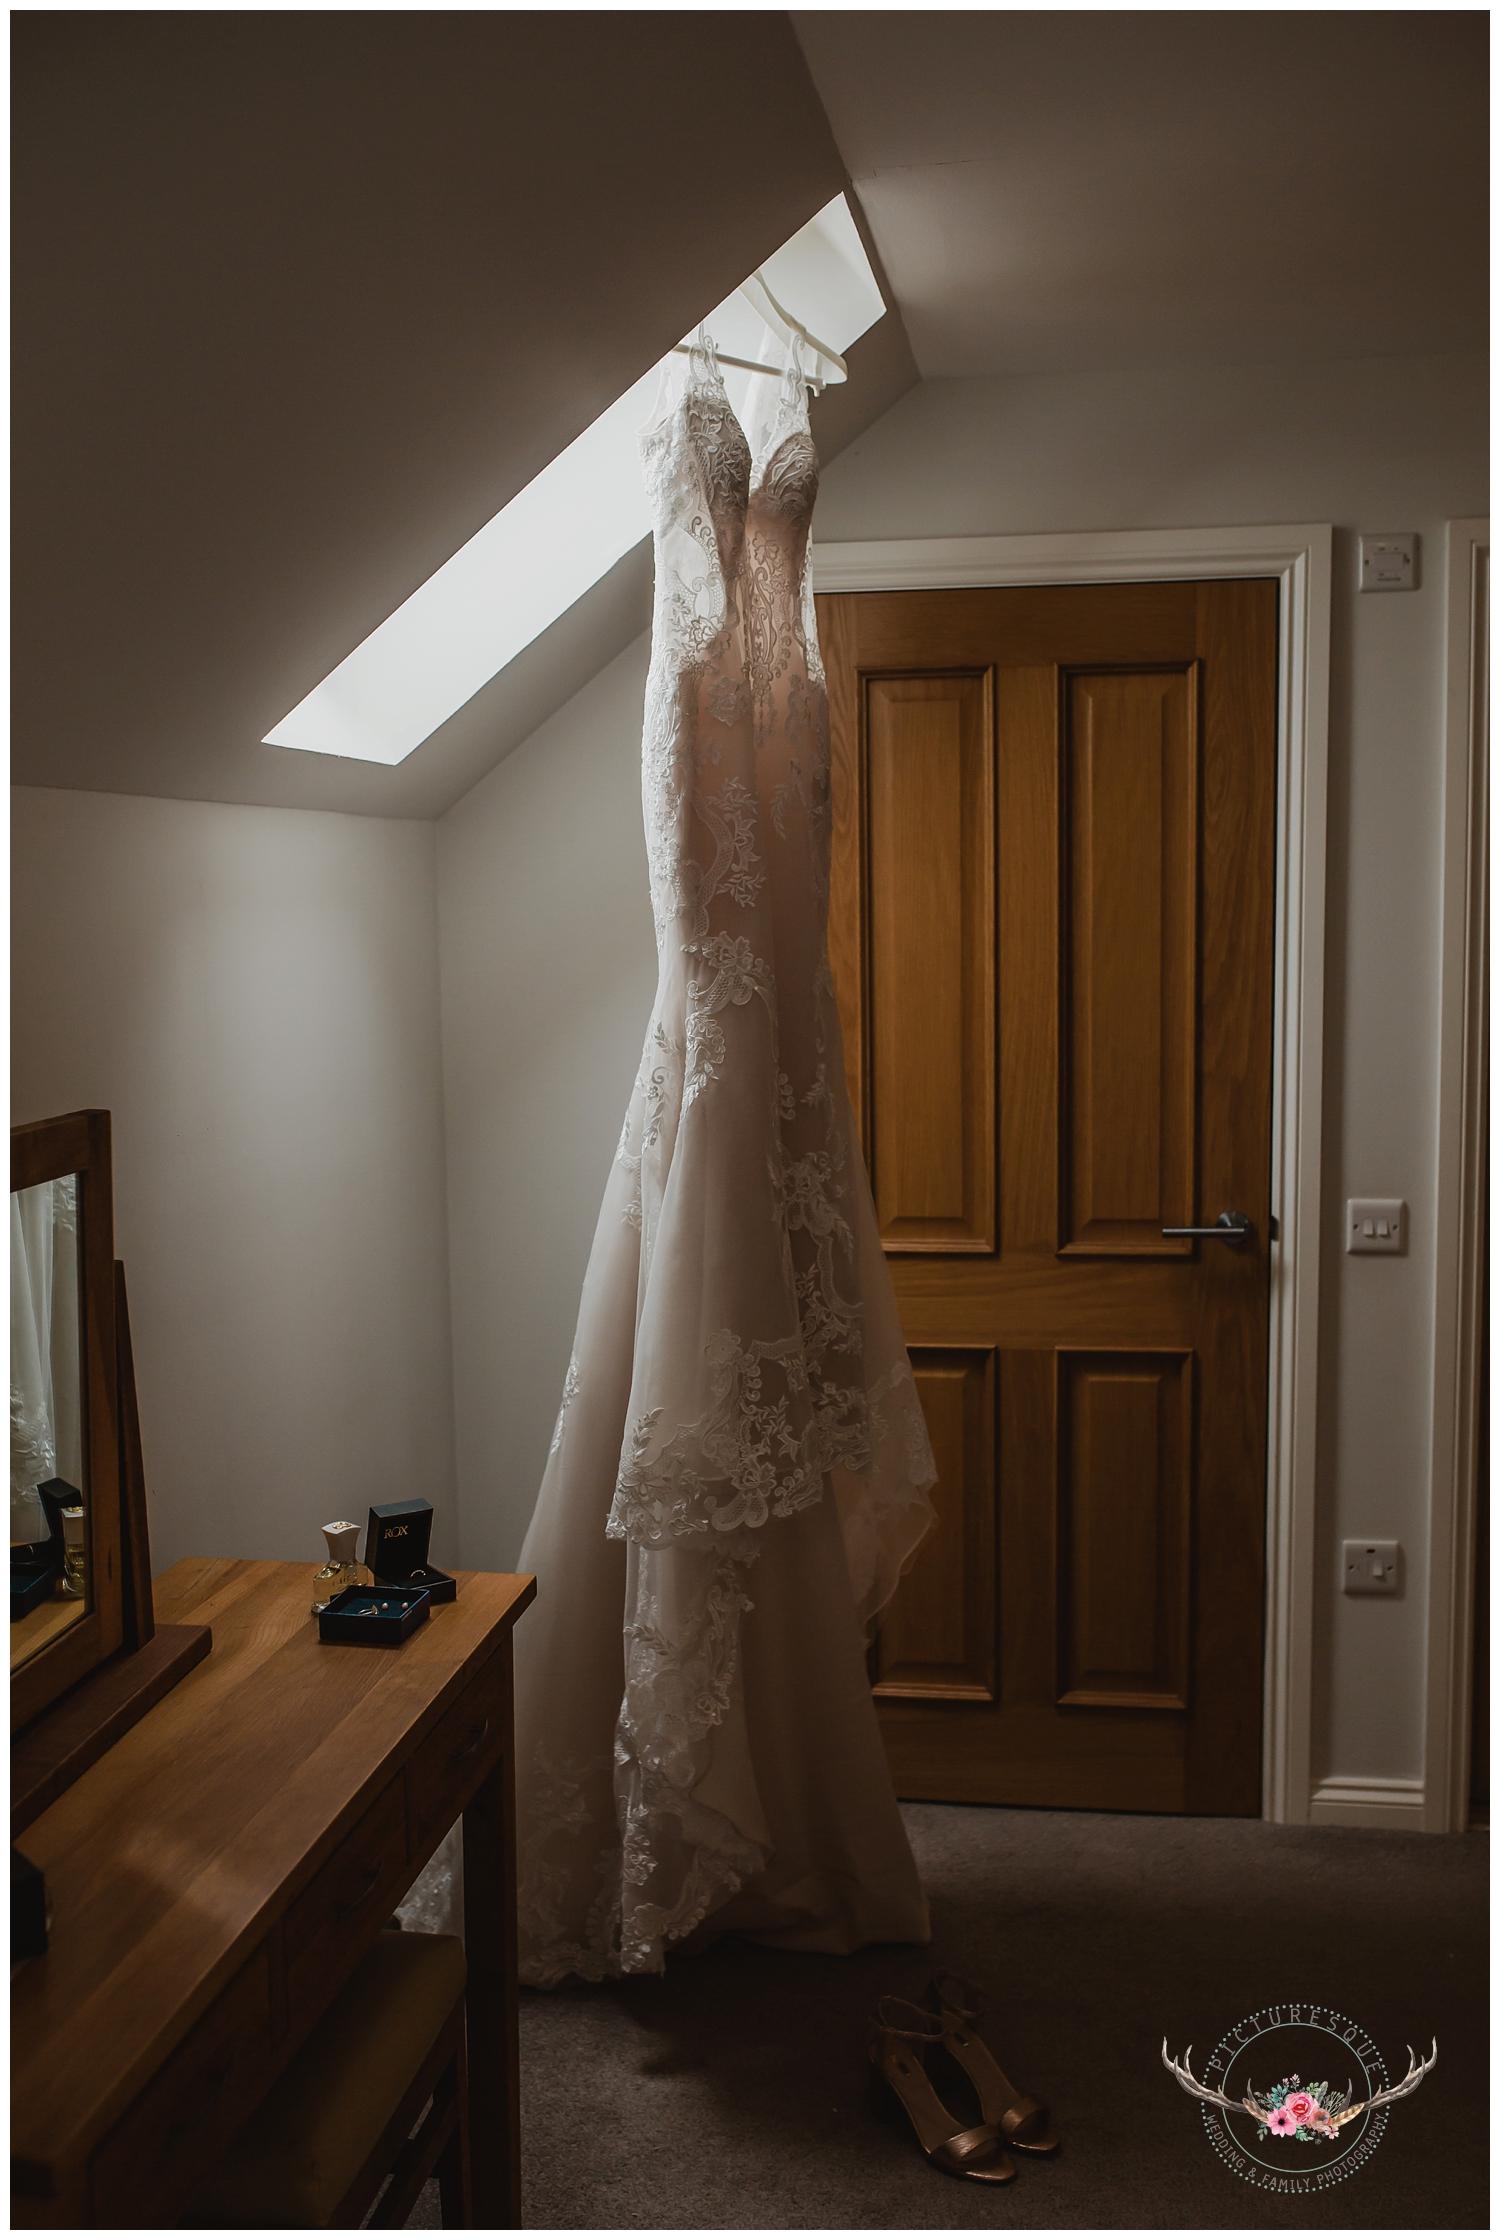 Kinkell Byre, Scottish wedding, Picturesque, WeddingPhotography, Scotland_0001.jpg